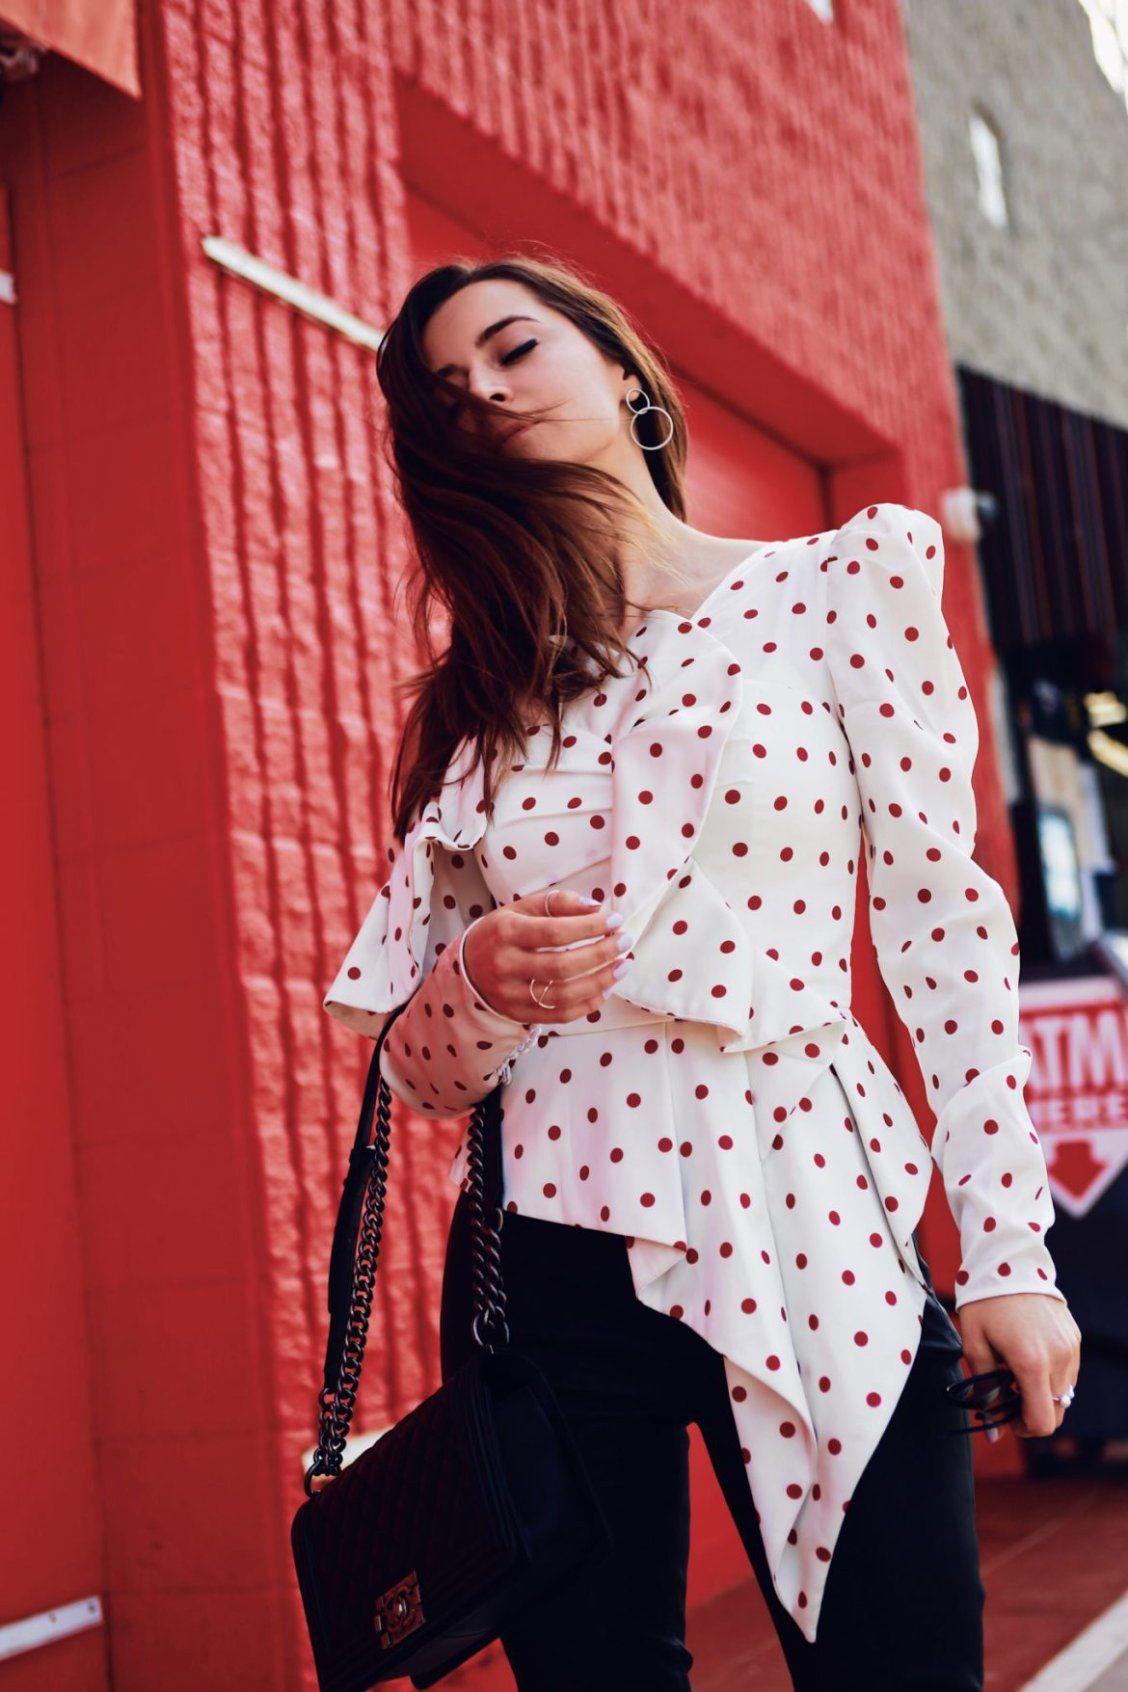 Julia Comil in Satin Polka Dot Frill Top by Self Portrait   FASHION ... 2589175c0d12